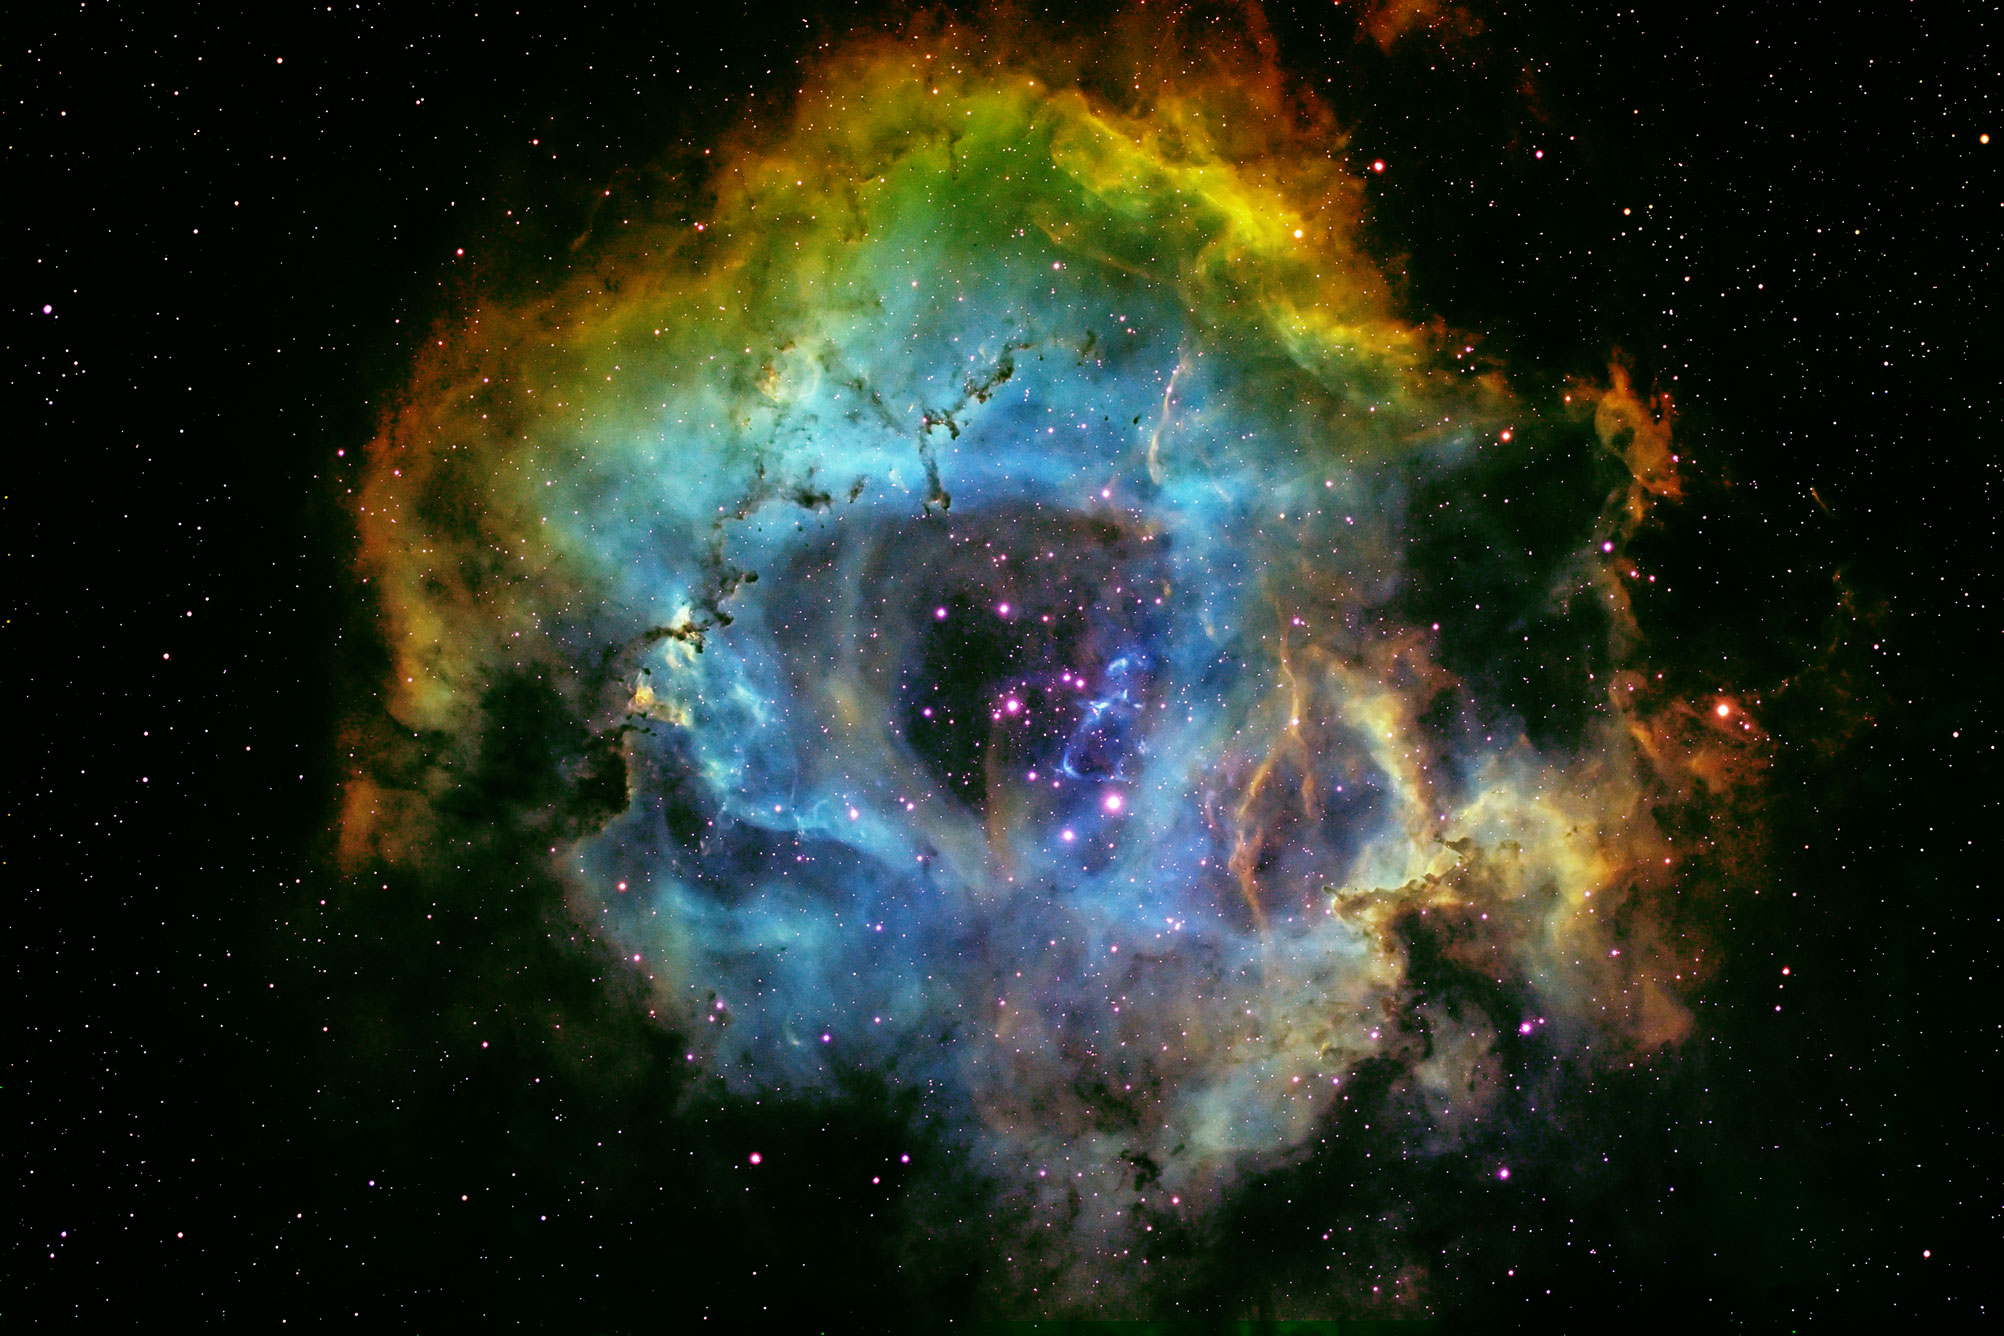 hourglass nebula wallpaper - photo #19